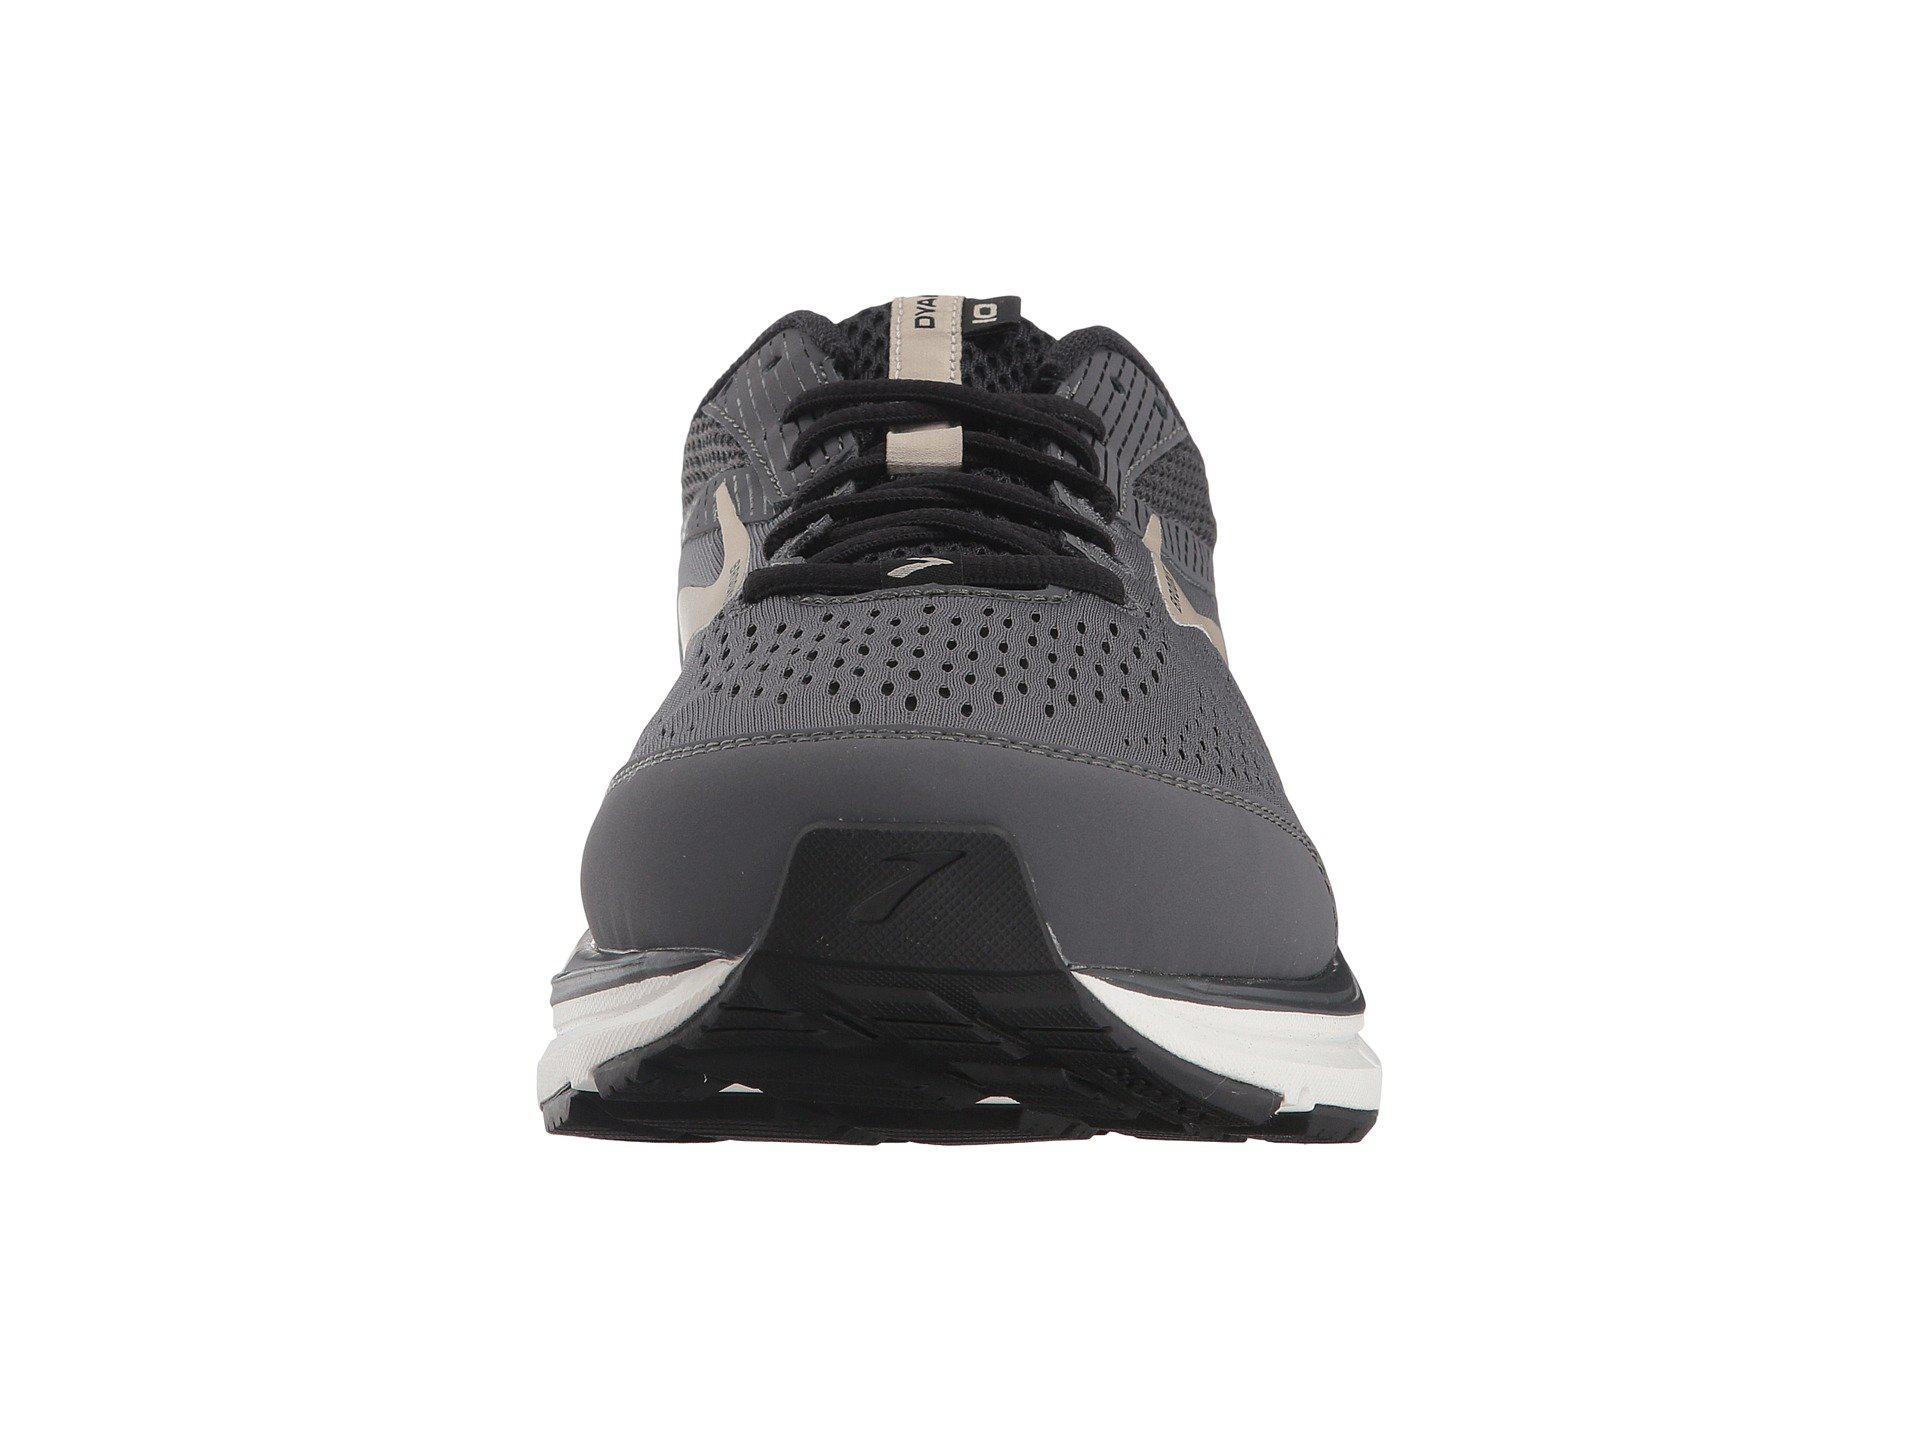 579885c24fe Brooks - Dyad 10 (grey black tan) Men s Running Shoes for Men. View  fullscreen